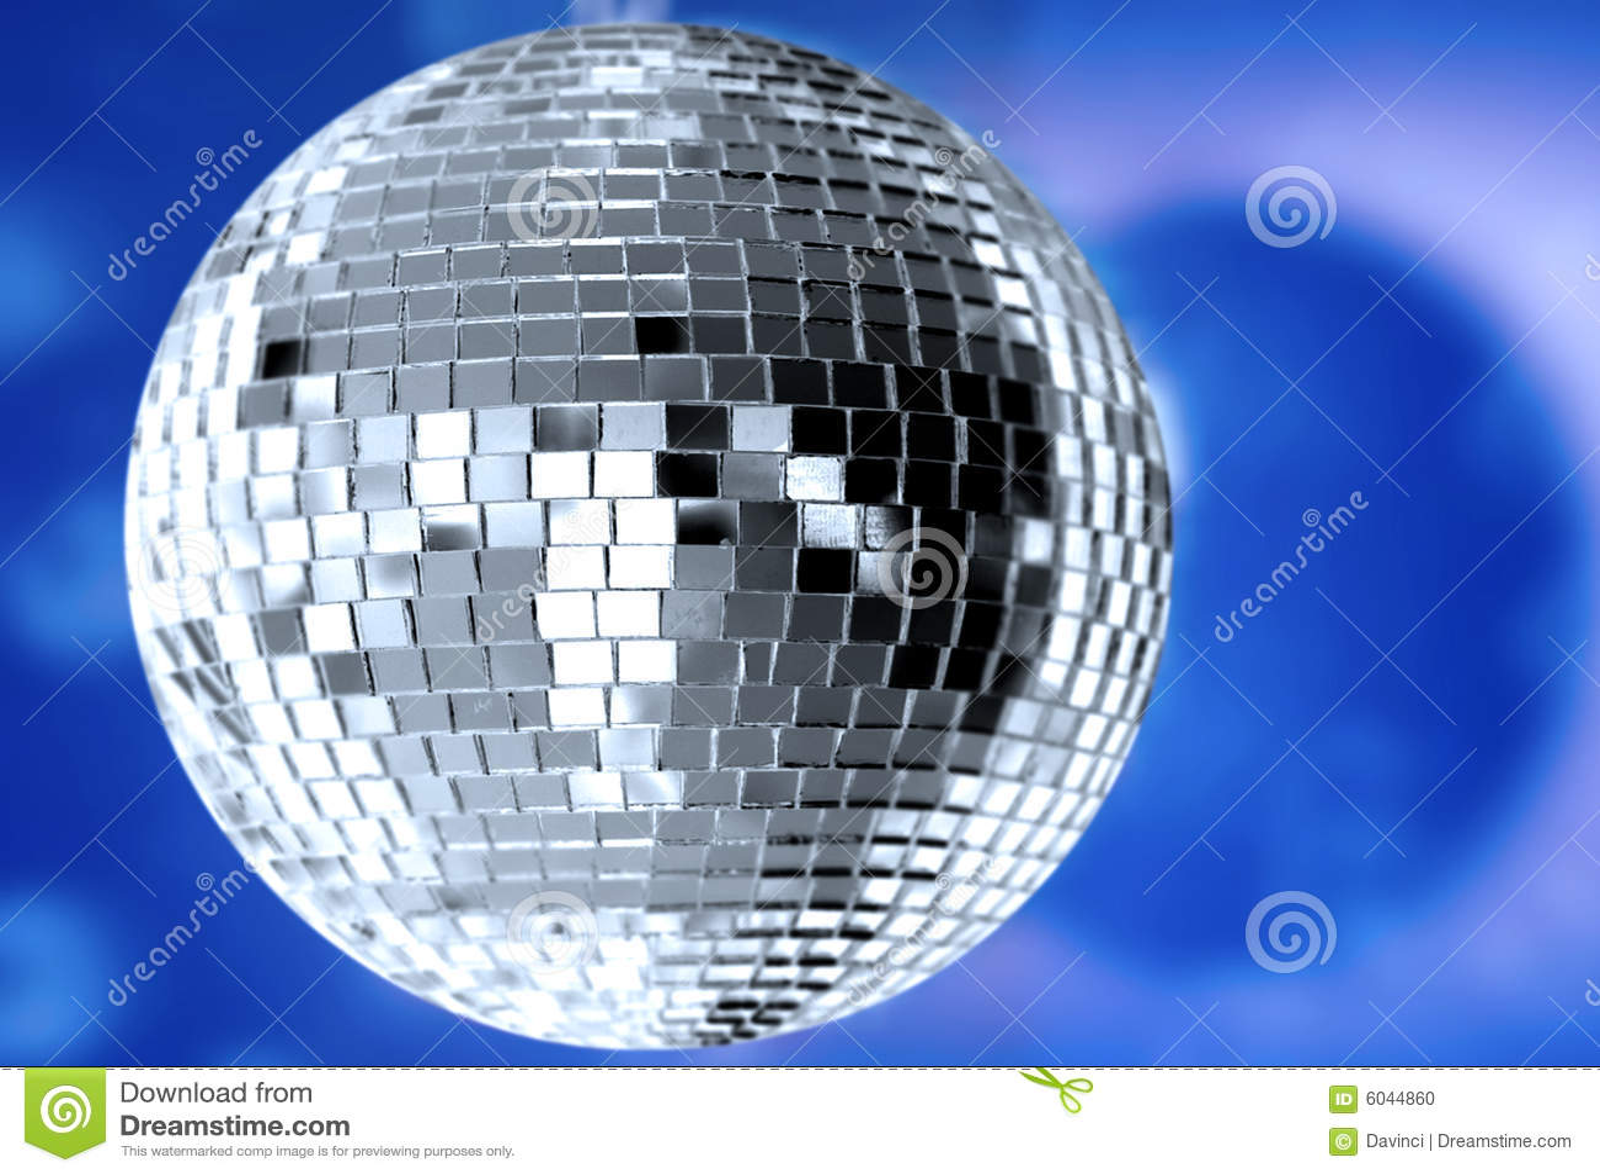 silver disco ball background - photo #26